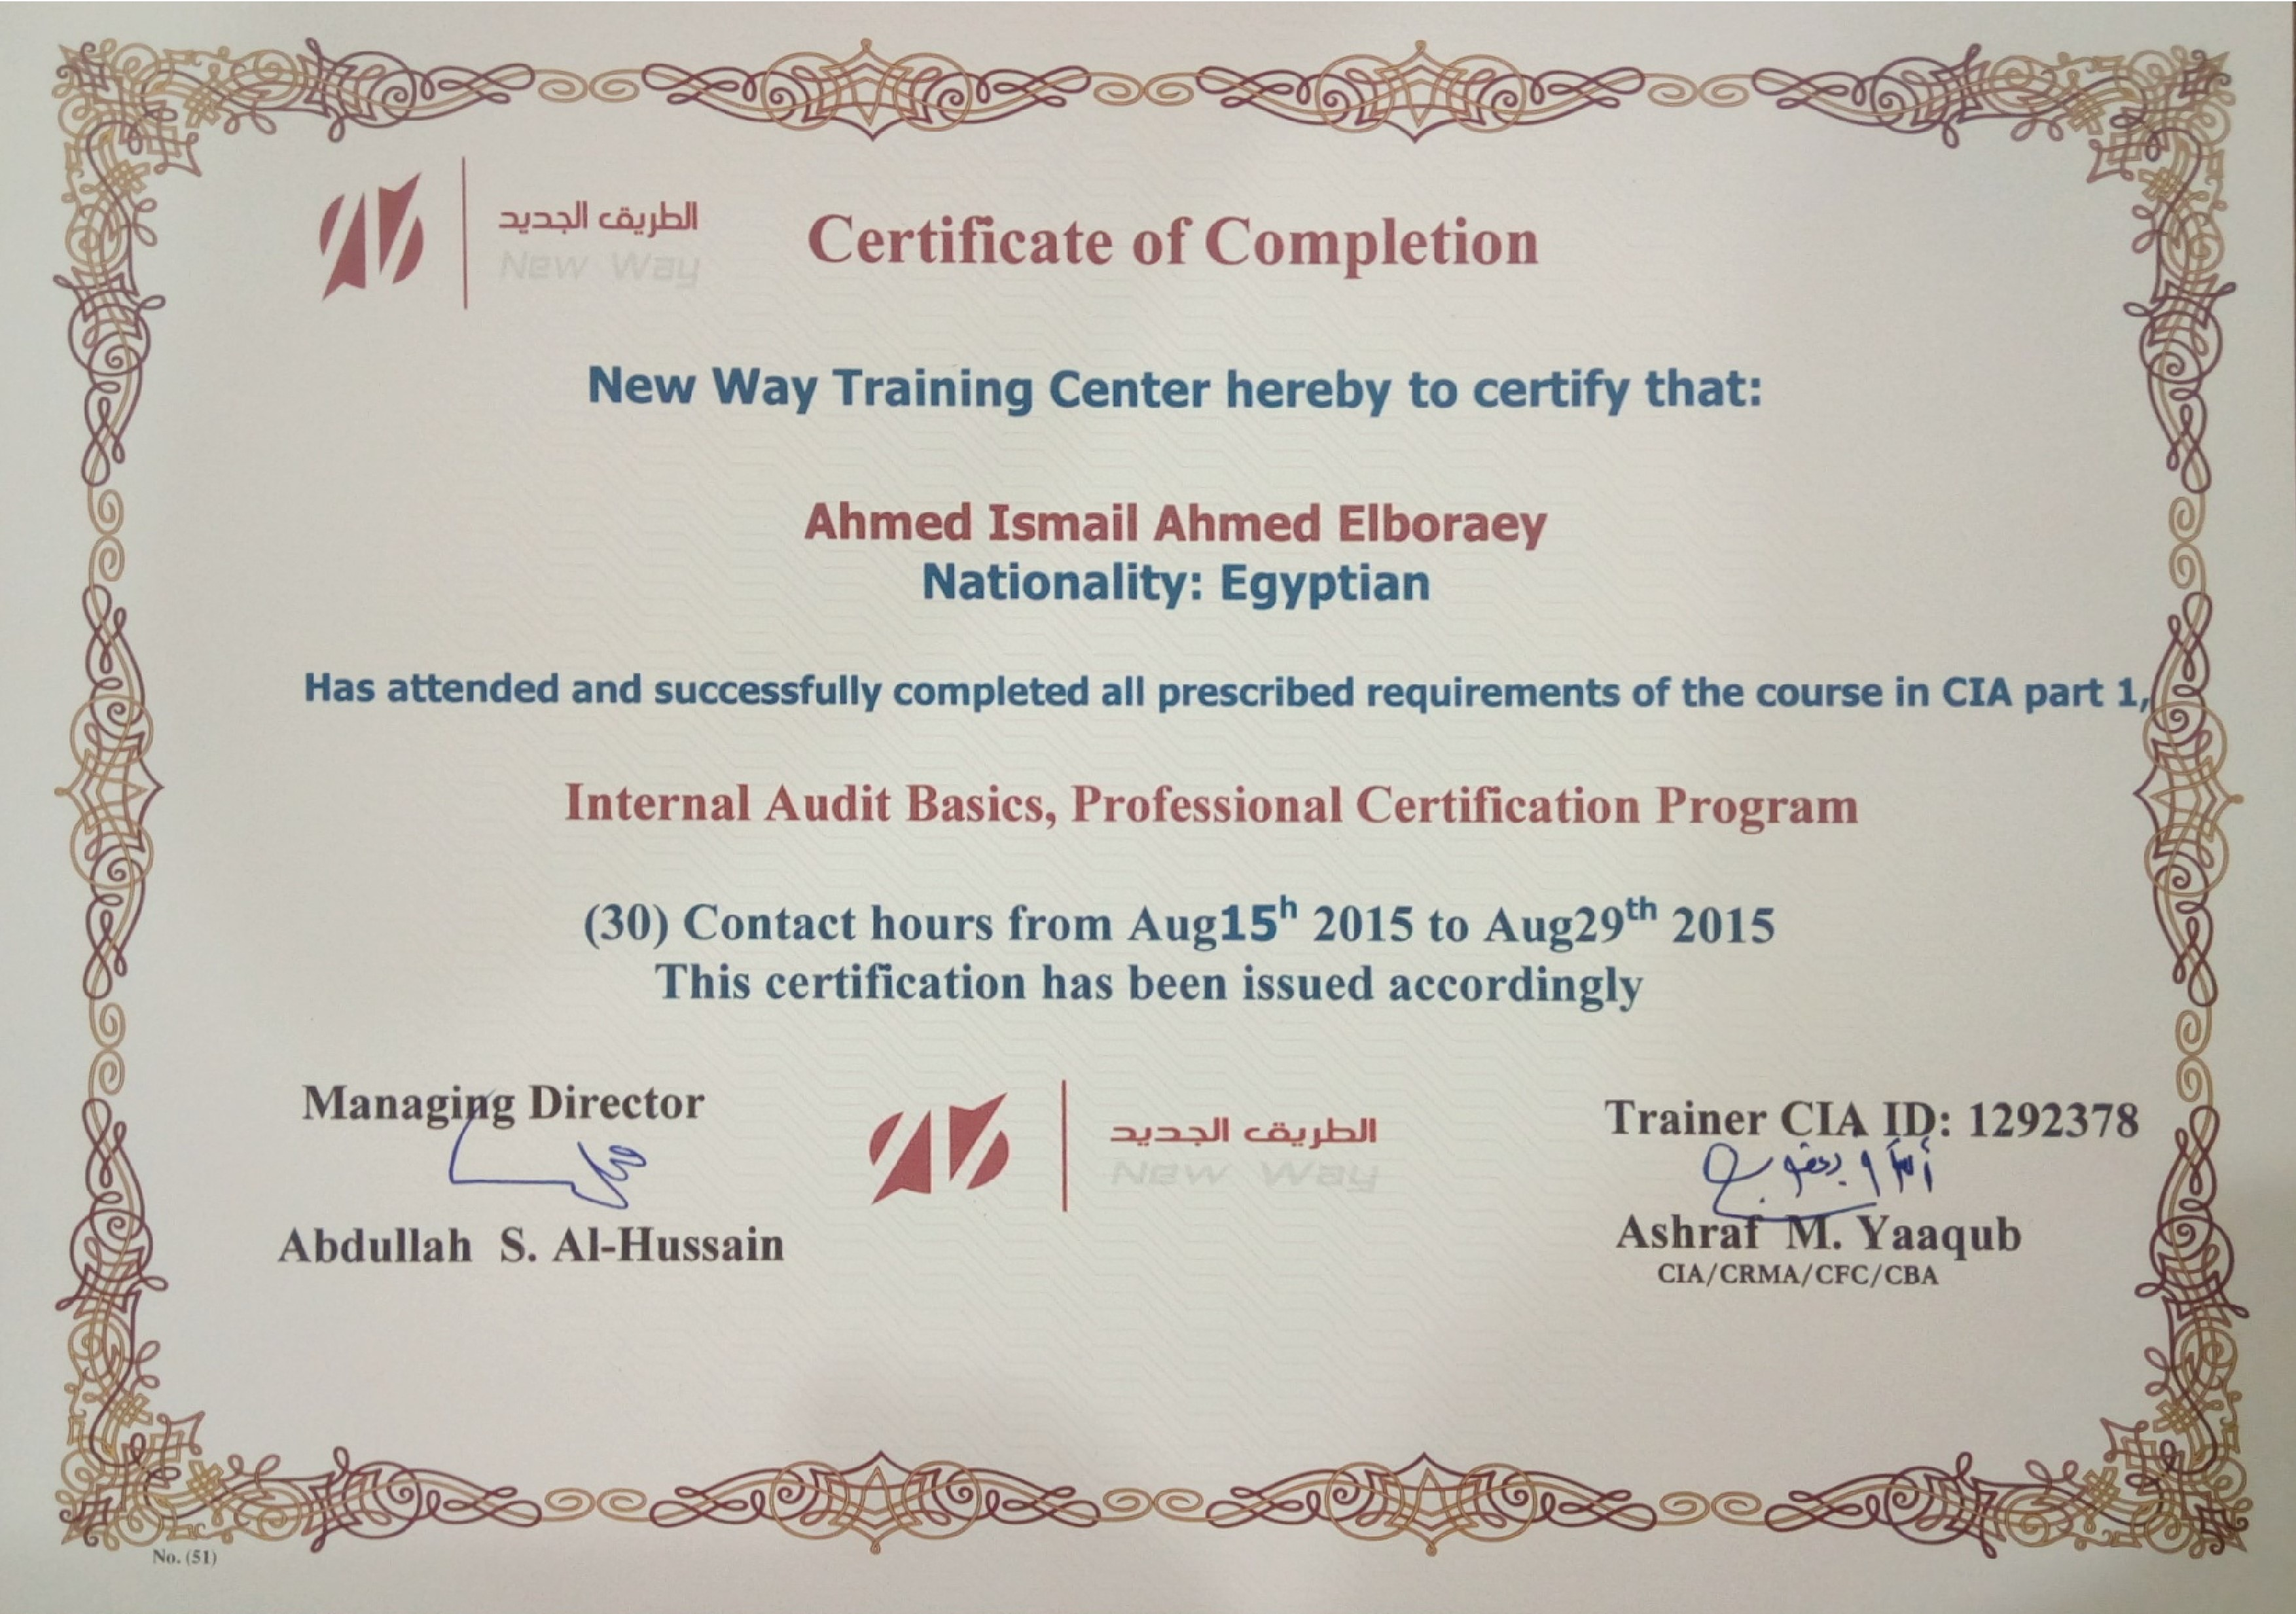 Ahmed Ismail Cfc Cfm Cm Certifr Cat Dipsfm Cia Candidate